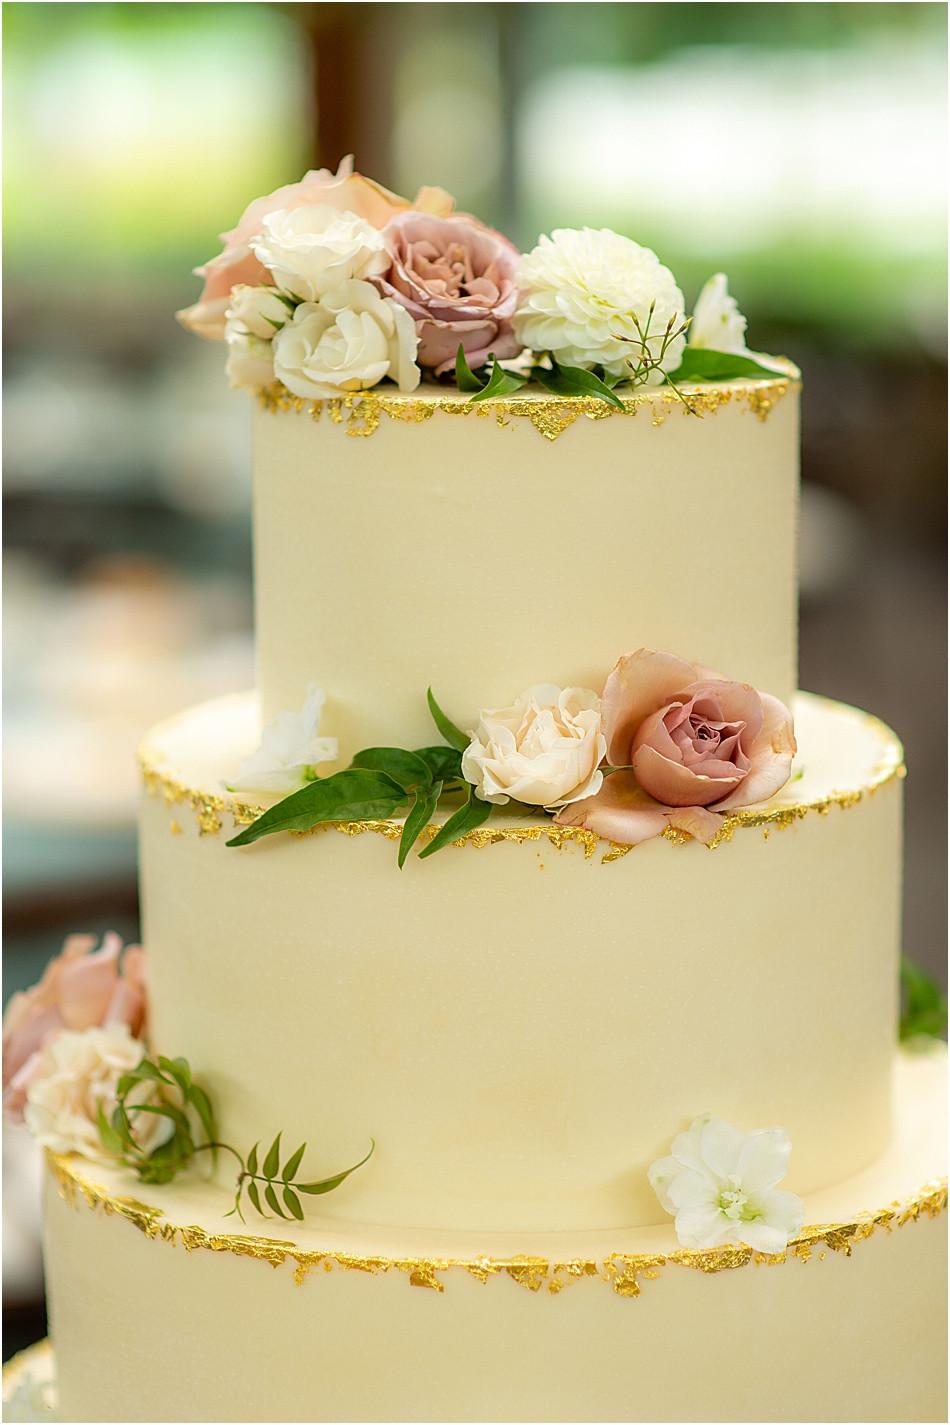 Kahn's Wedding Cake